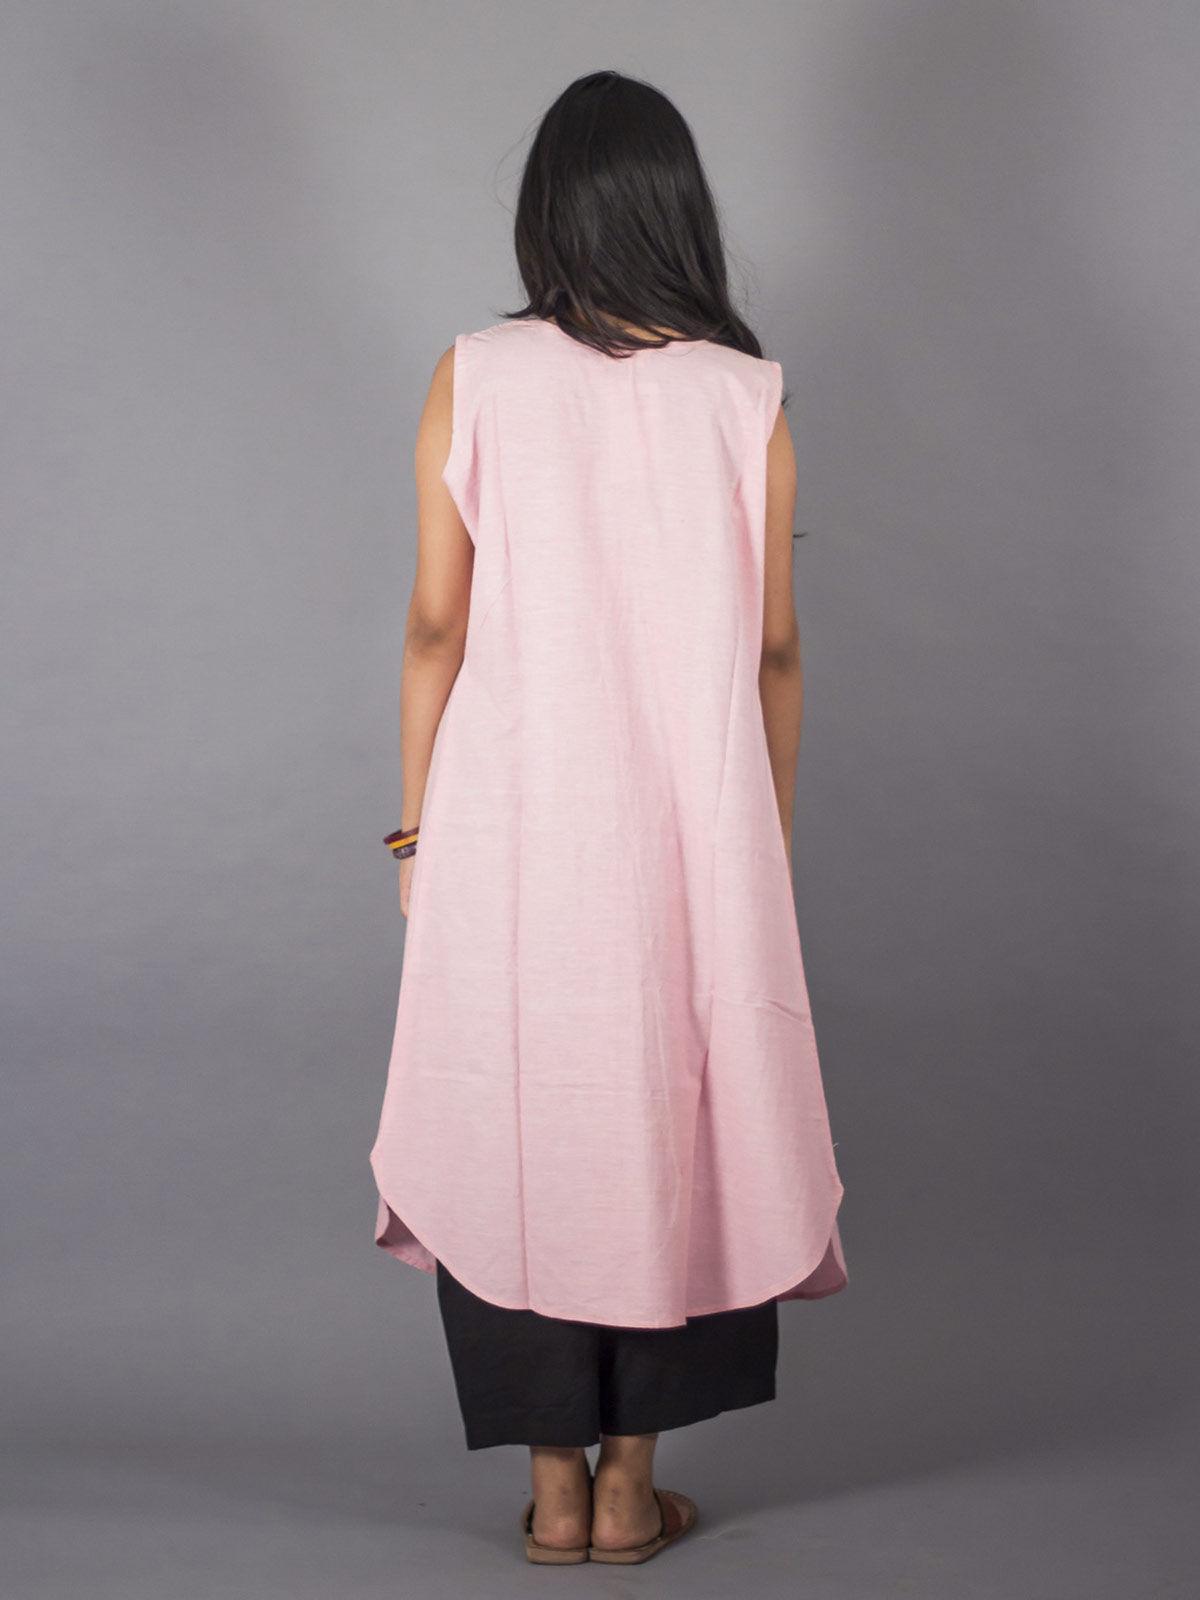 PinkEmbroidered Long Shrug